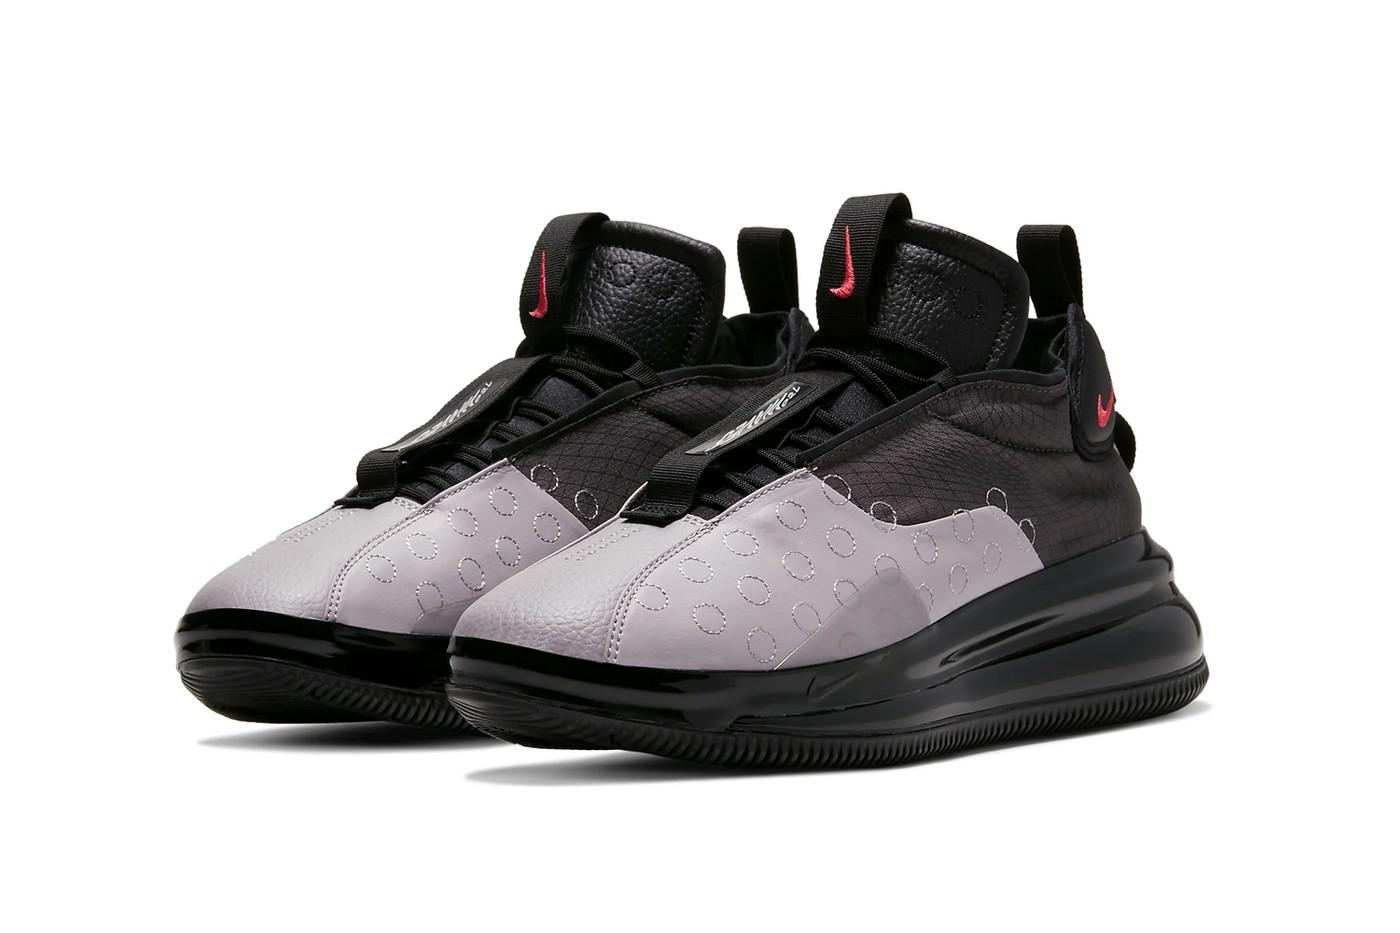 Nike,Air Max 720,发售 买鞋送挎包!颠覆传统的 Nike D/MS/X 系列又出新鞋了!